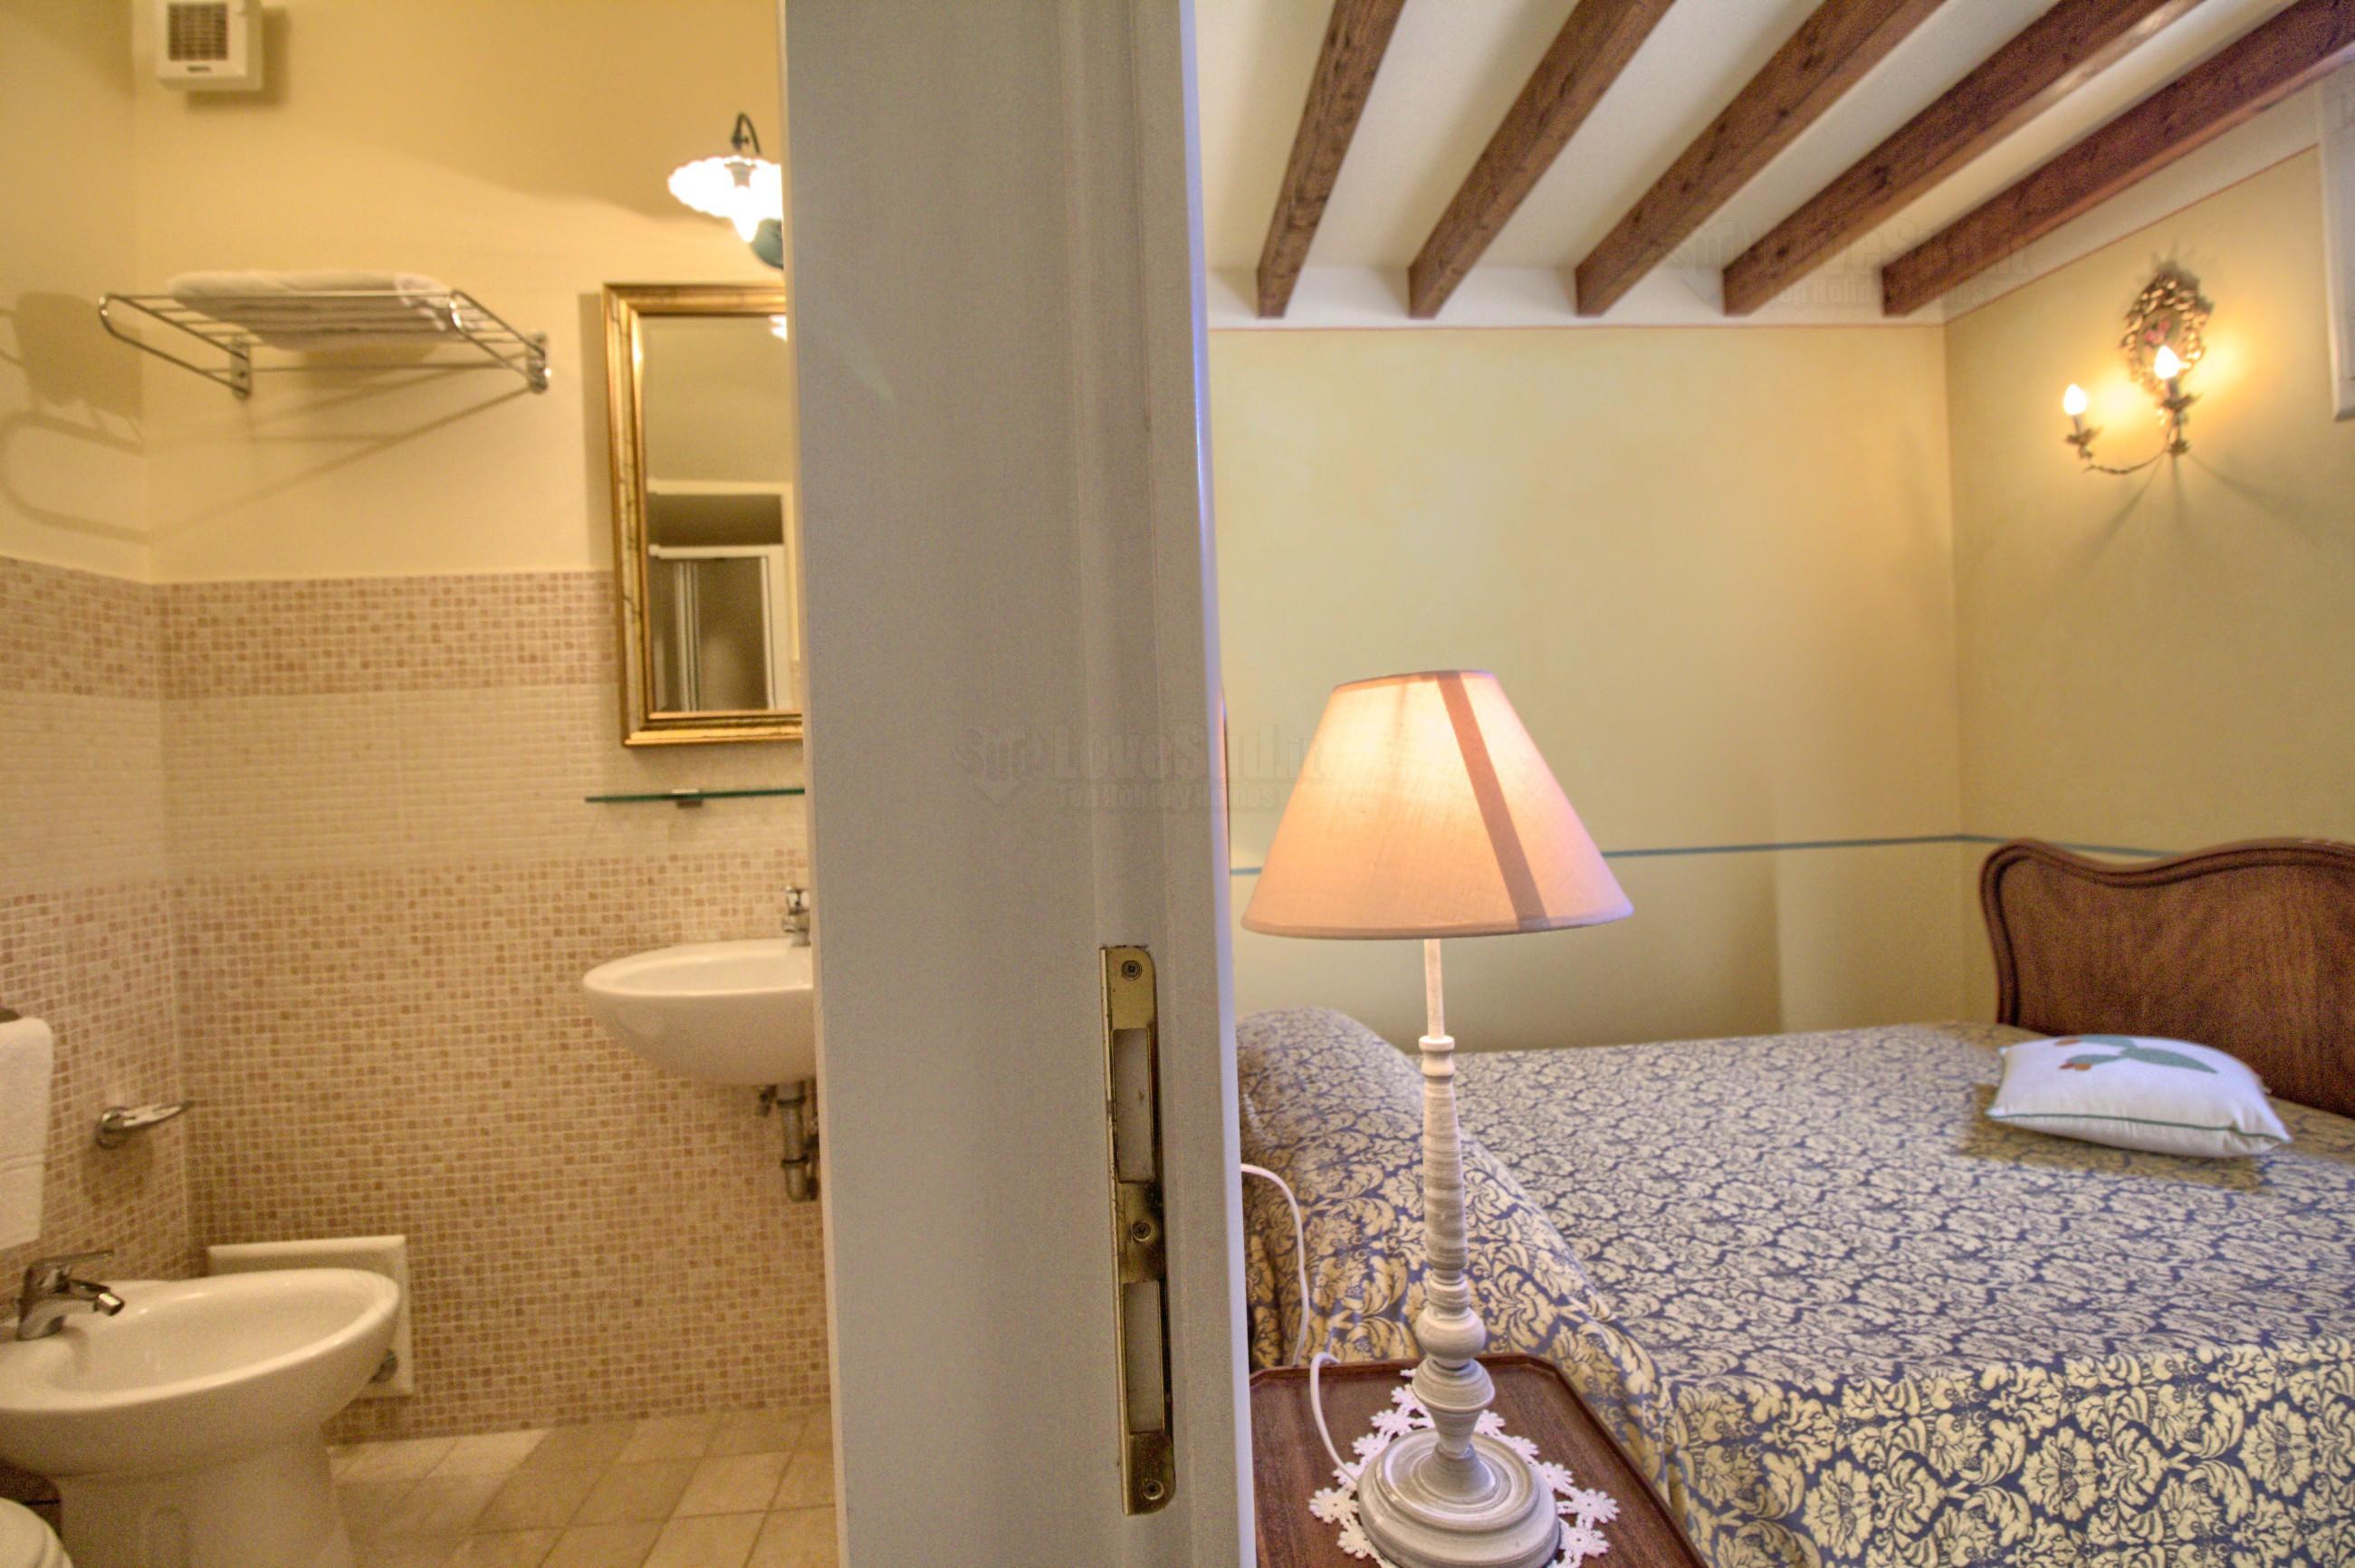 Apartment Gialla - B B A palazzo photo 21630622